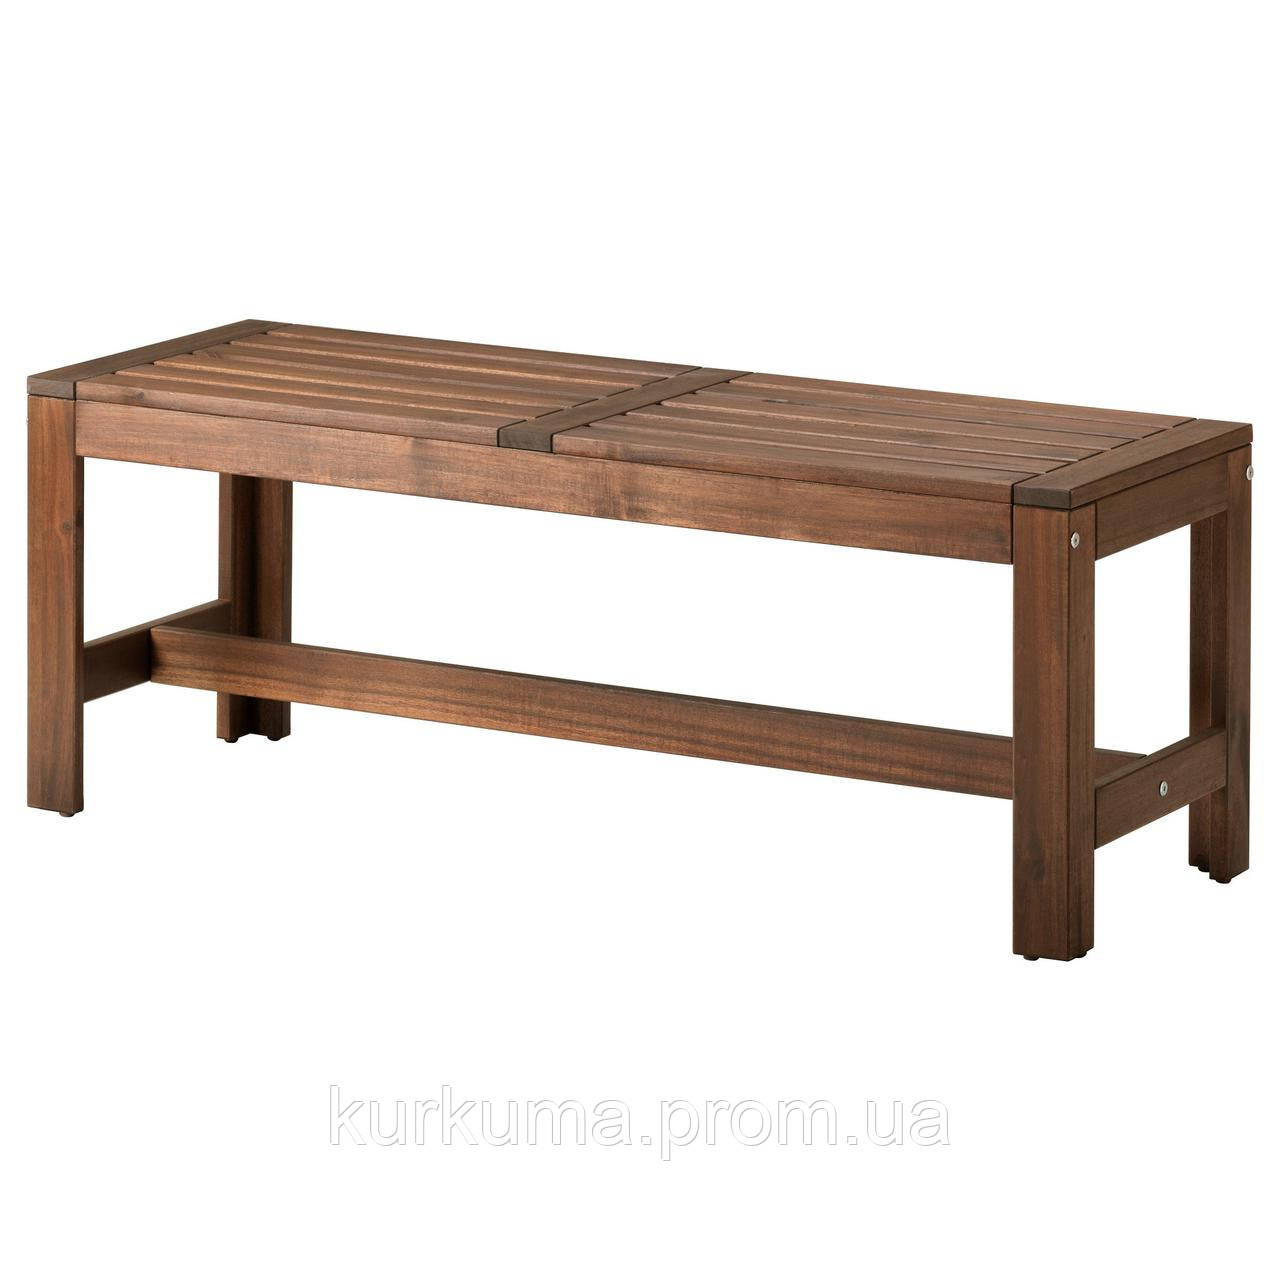 IKEA APPLARO Садовая скамейка, коричневая морилка  (102.051.81)